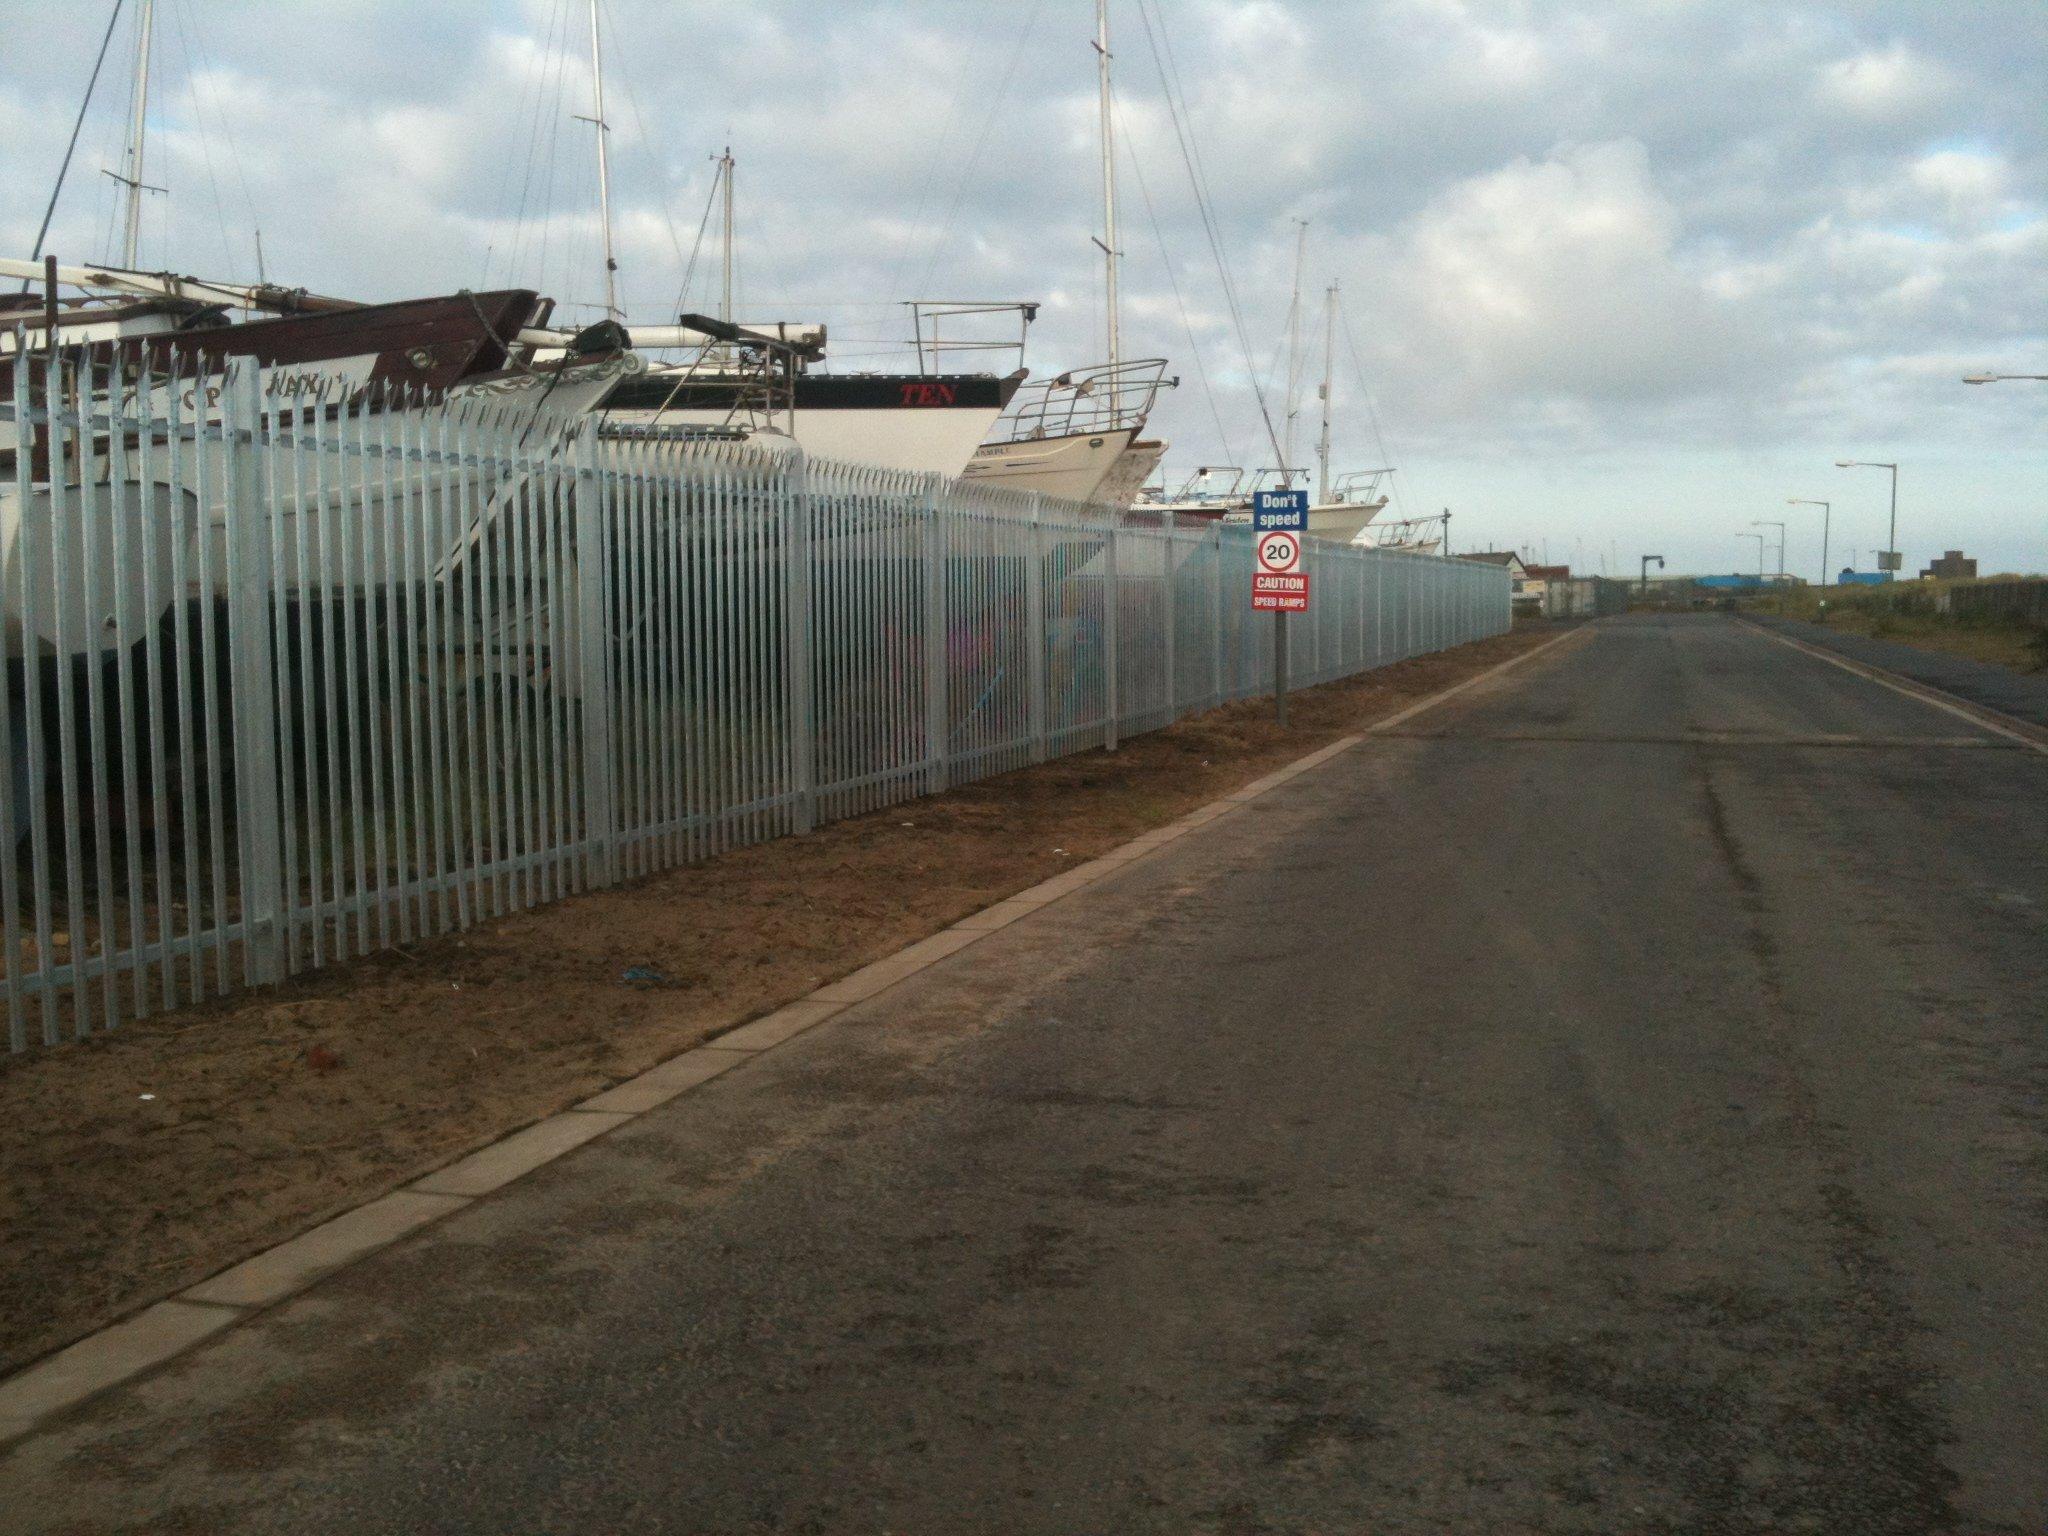 Palisade fencing to royal Northumberland Yacht club 3